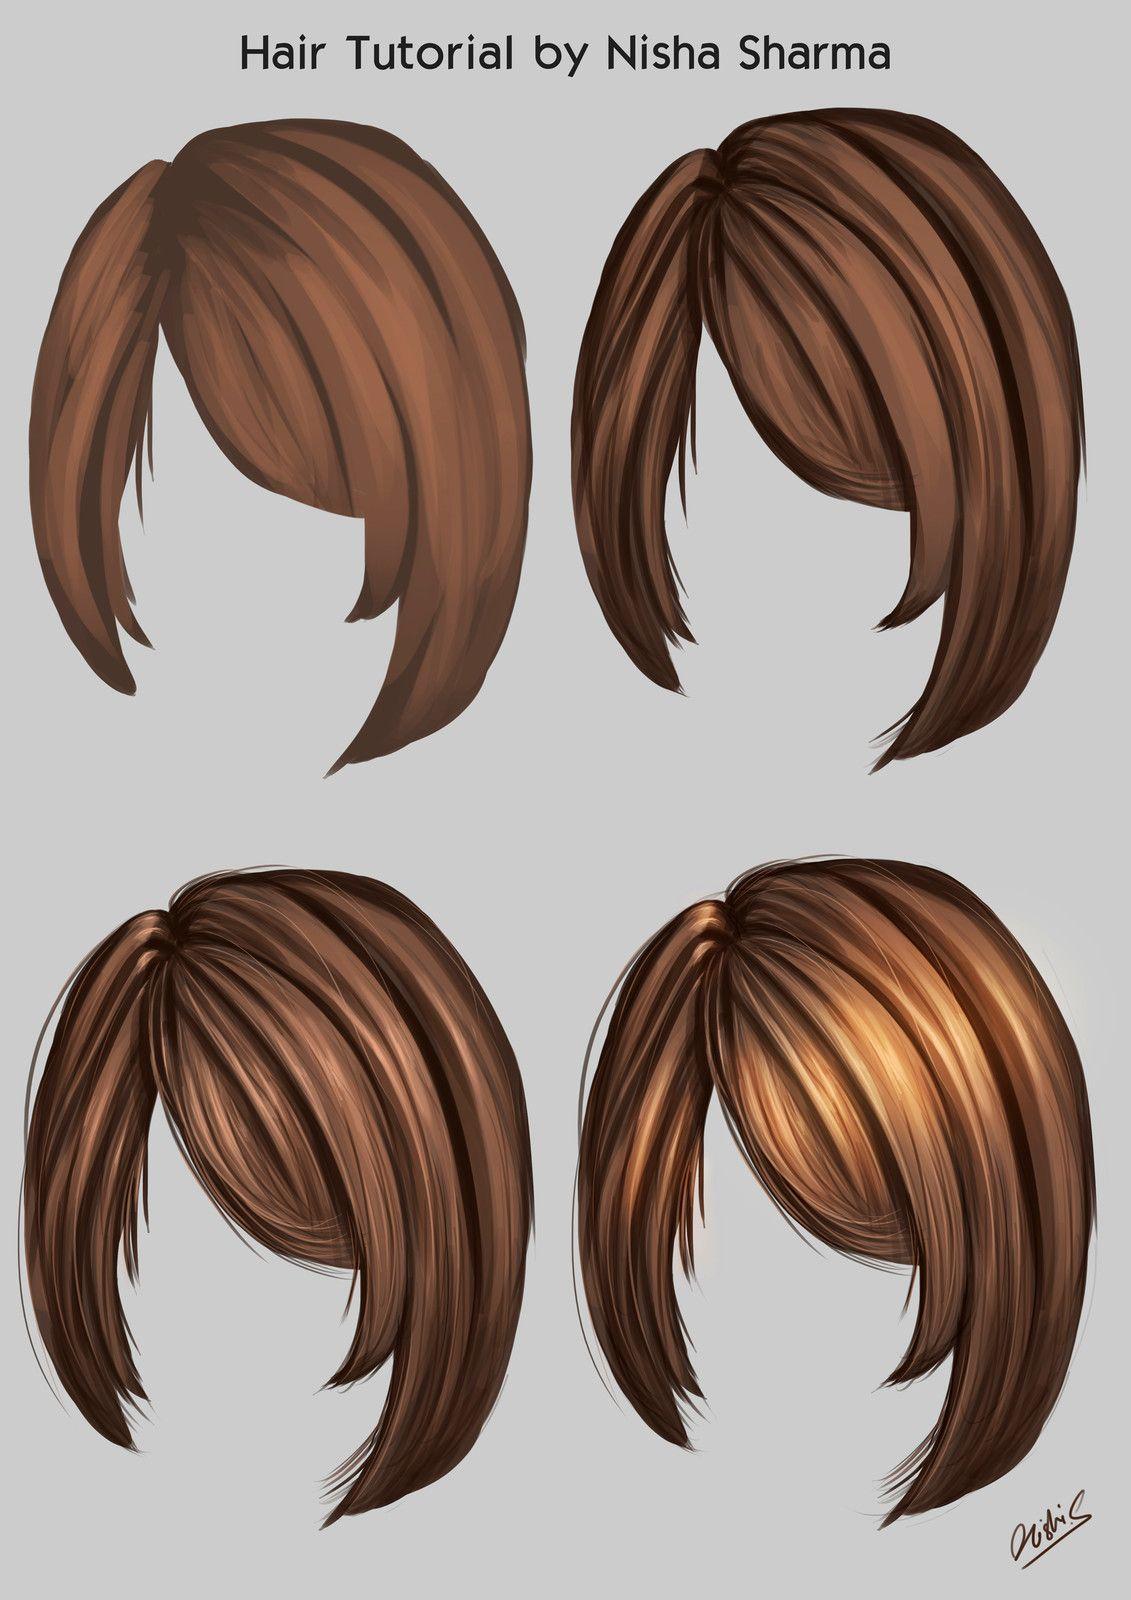 Hair Rendering Tutorial Nisha Sharma Digital Painting Tutorials Drawing Hair Tutorial Digital Art Tutorial